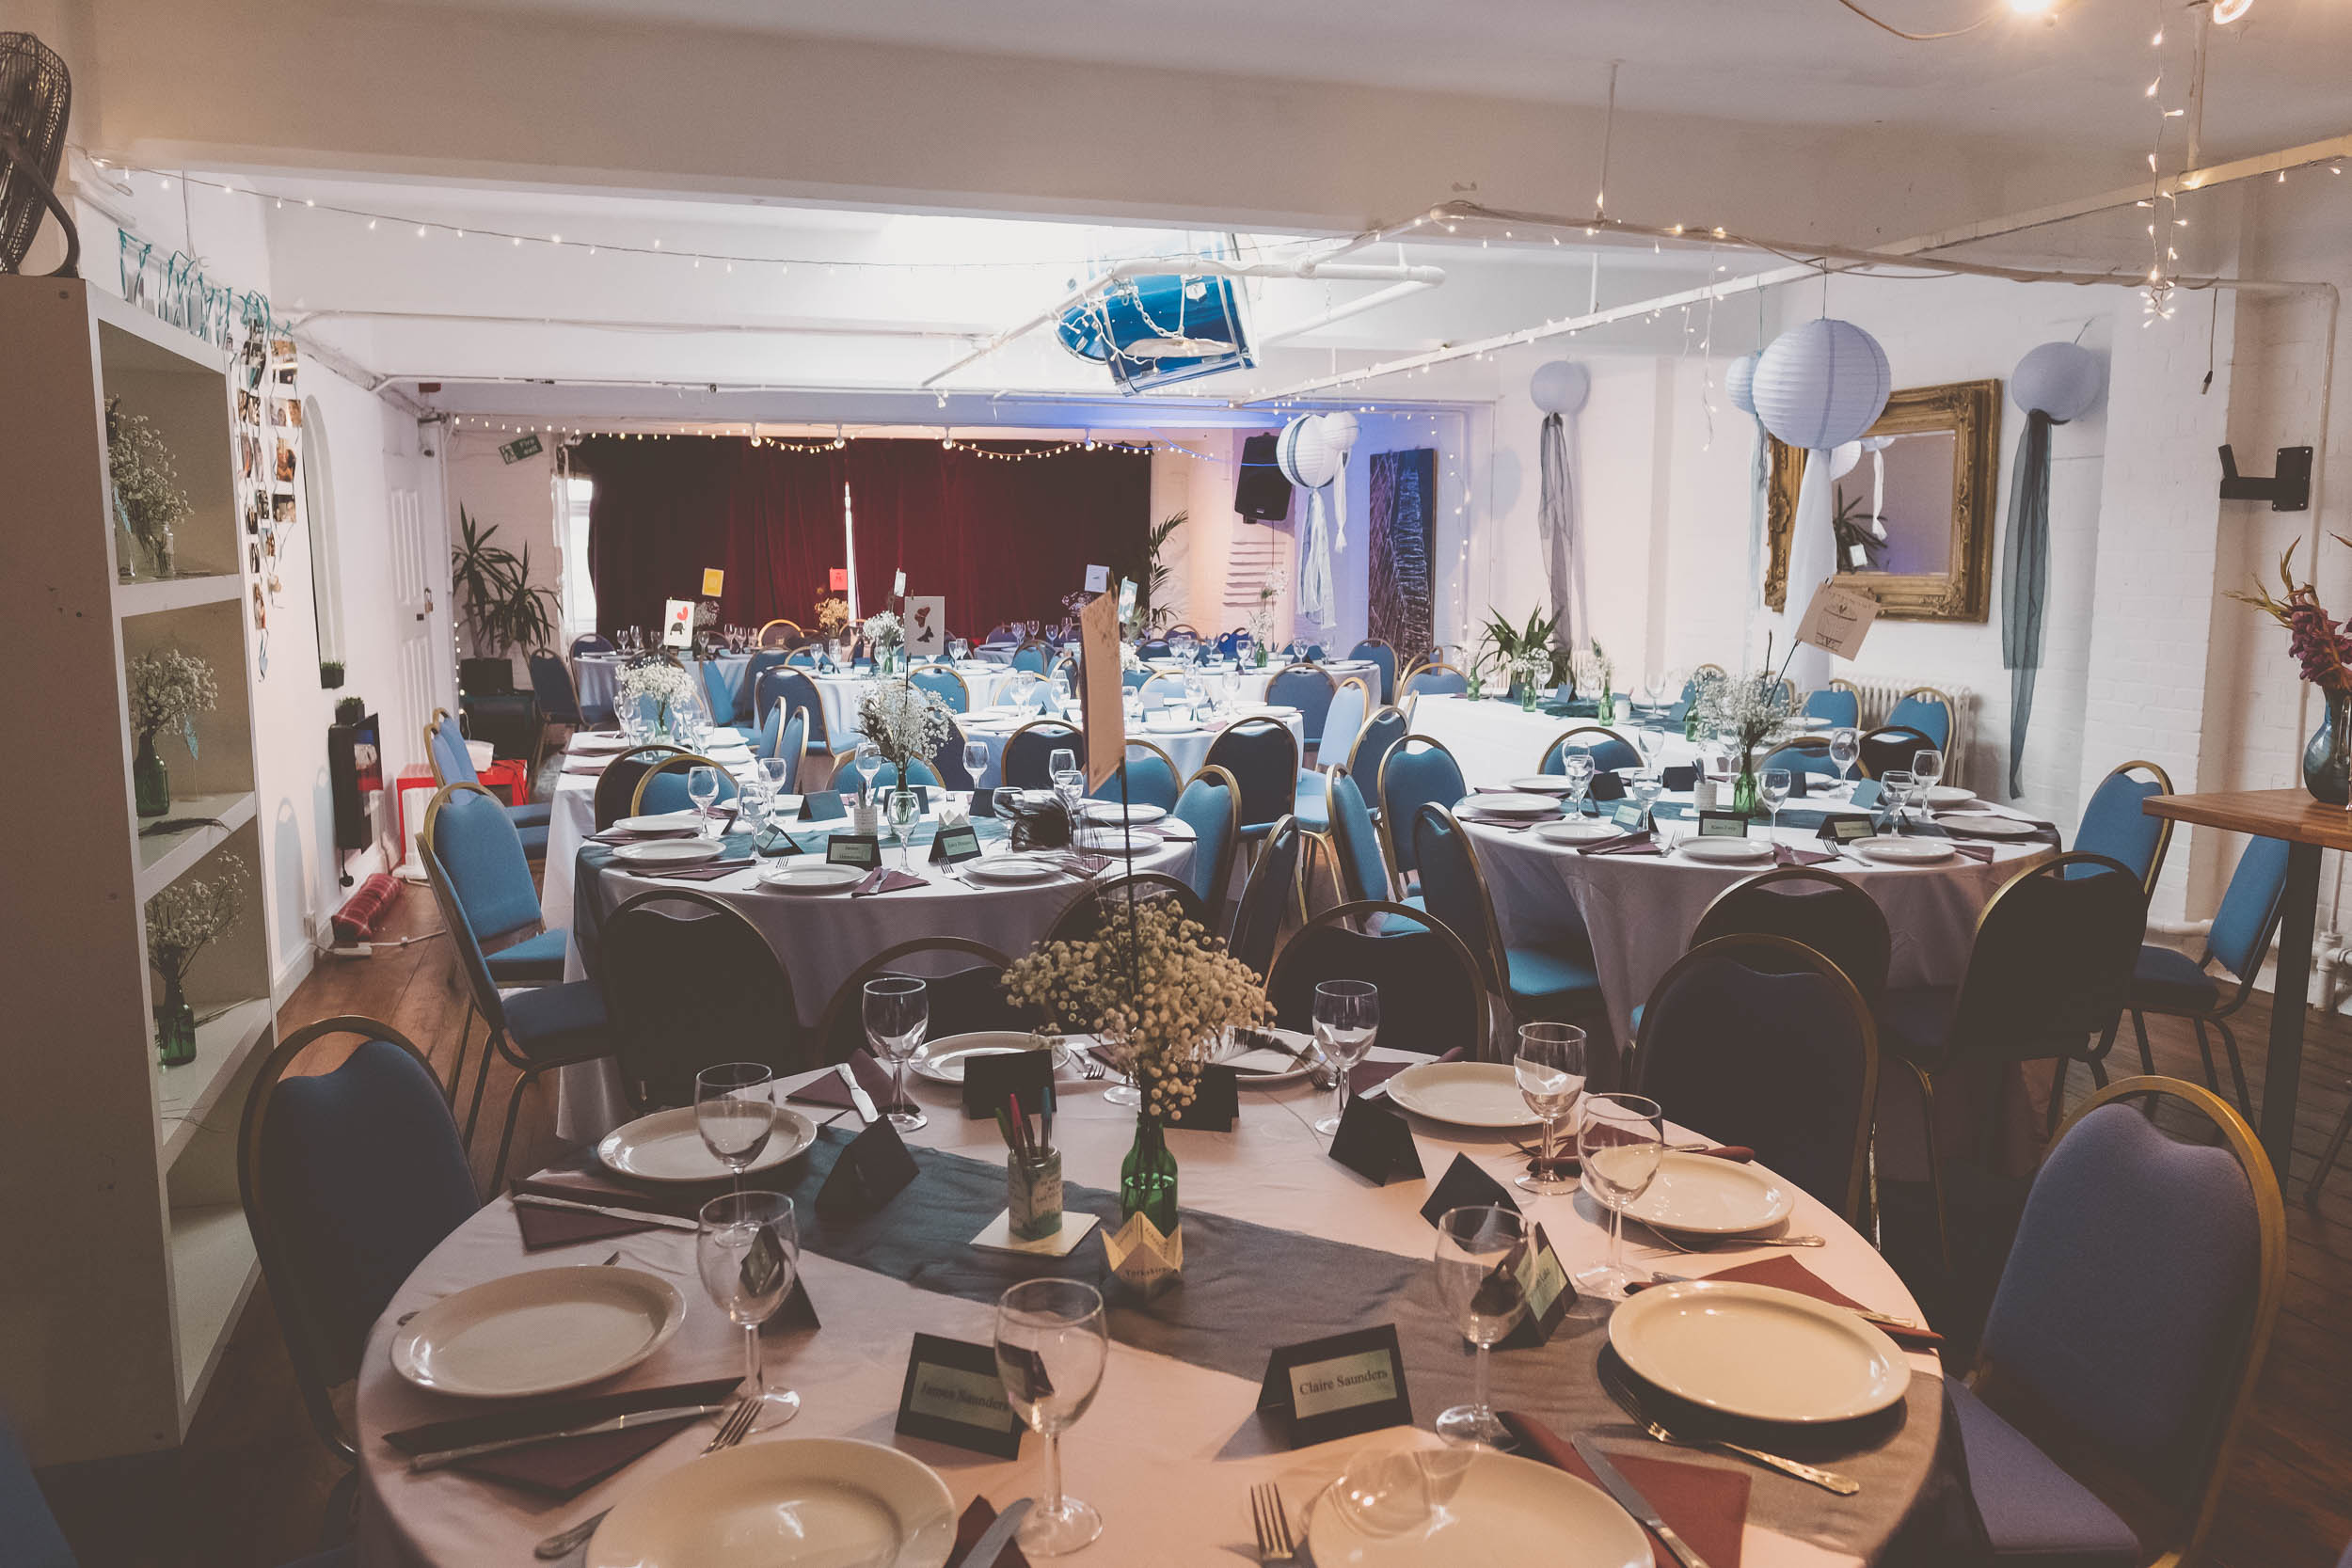 islington-town-hall-4th-floor-studios-wedding232.jpg